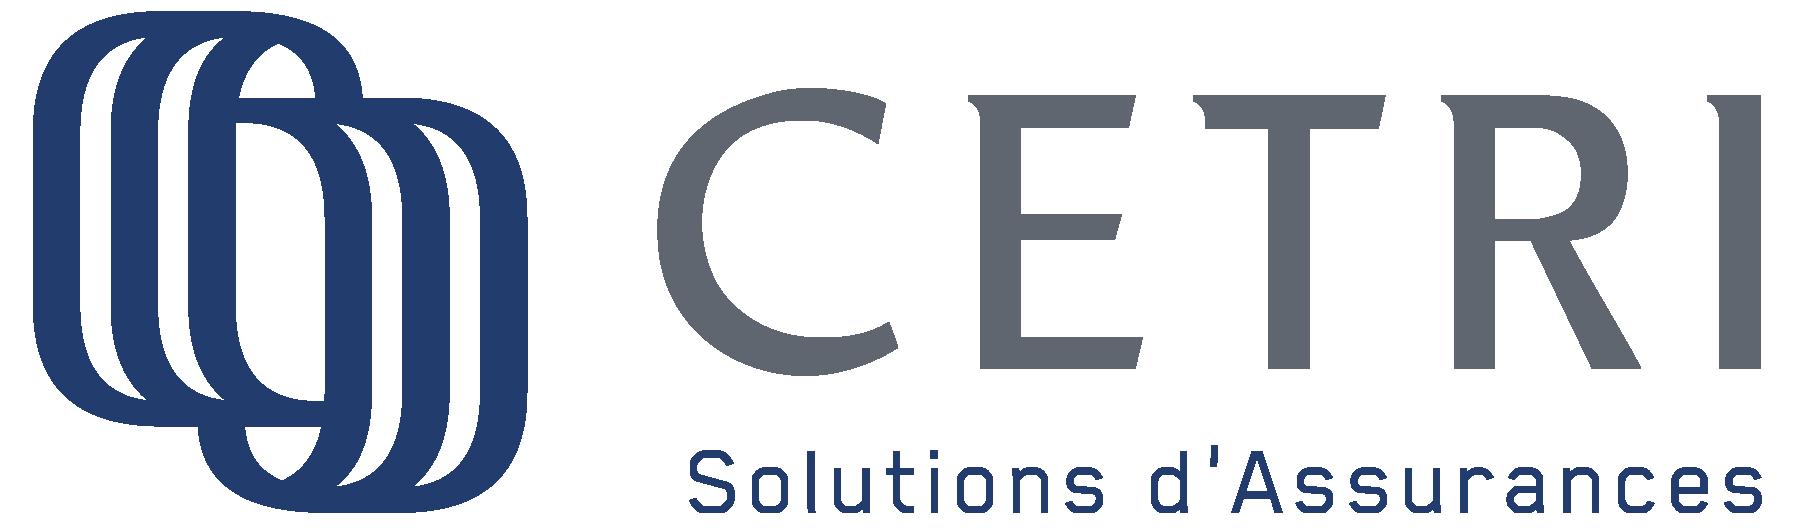 CETRI Sponsor de MOOVELAB